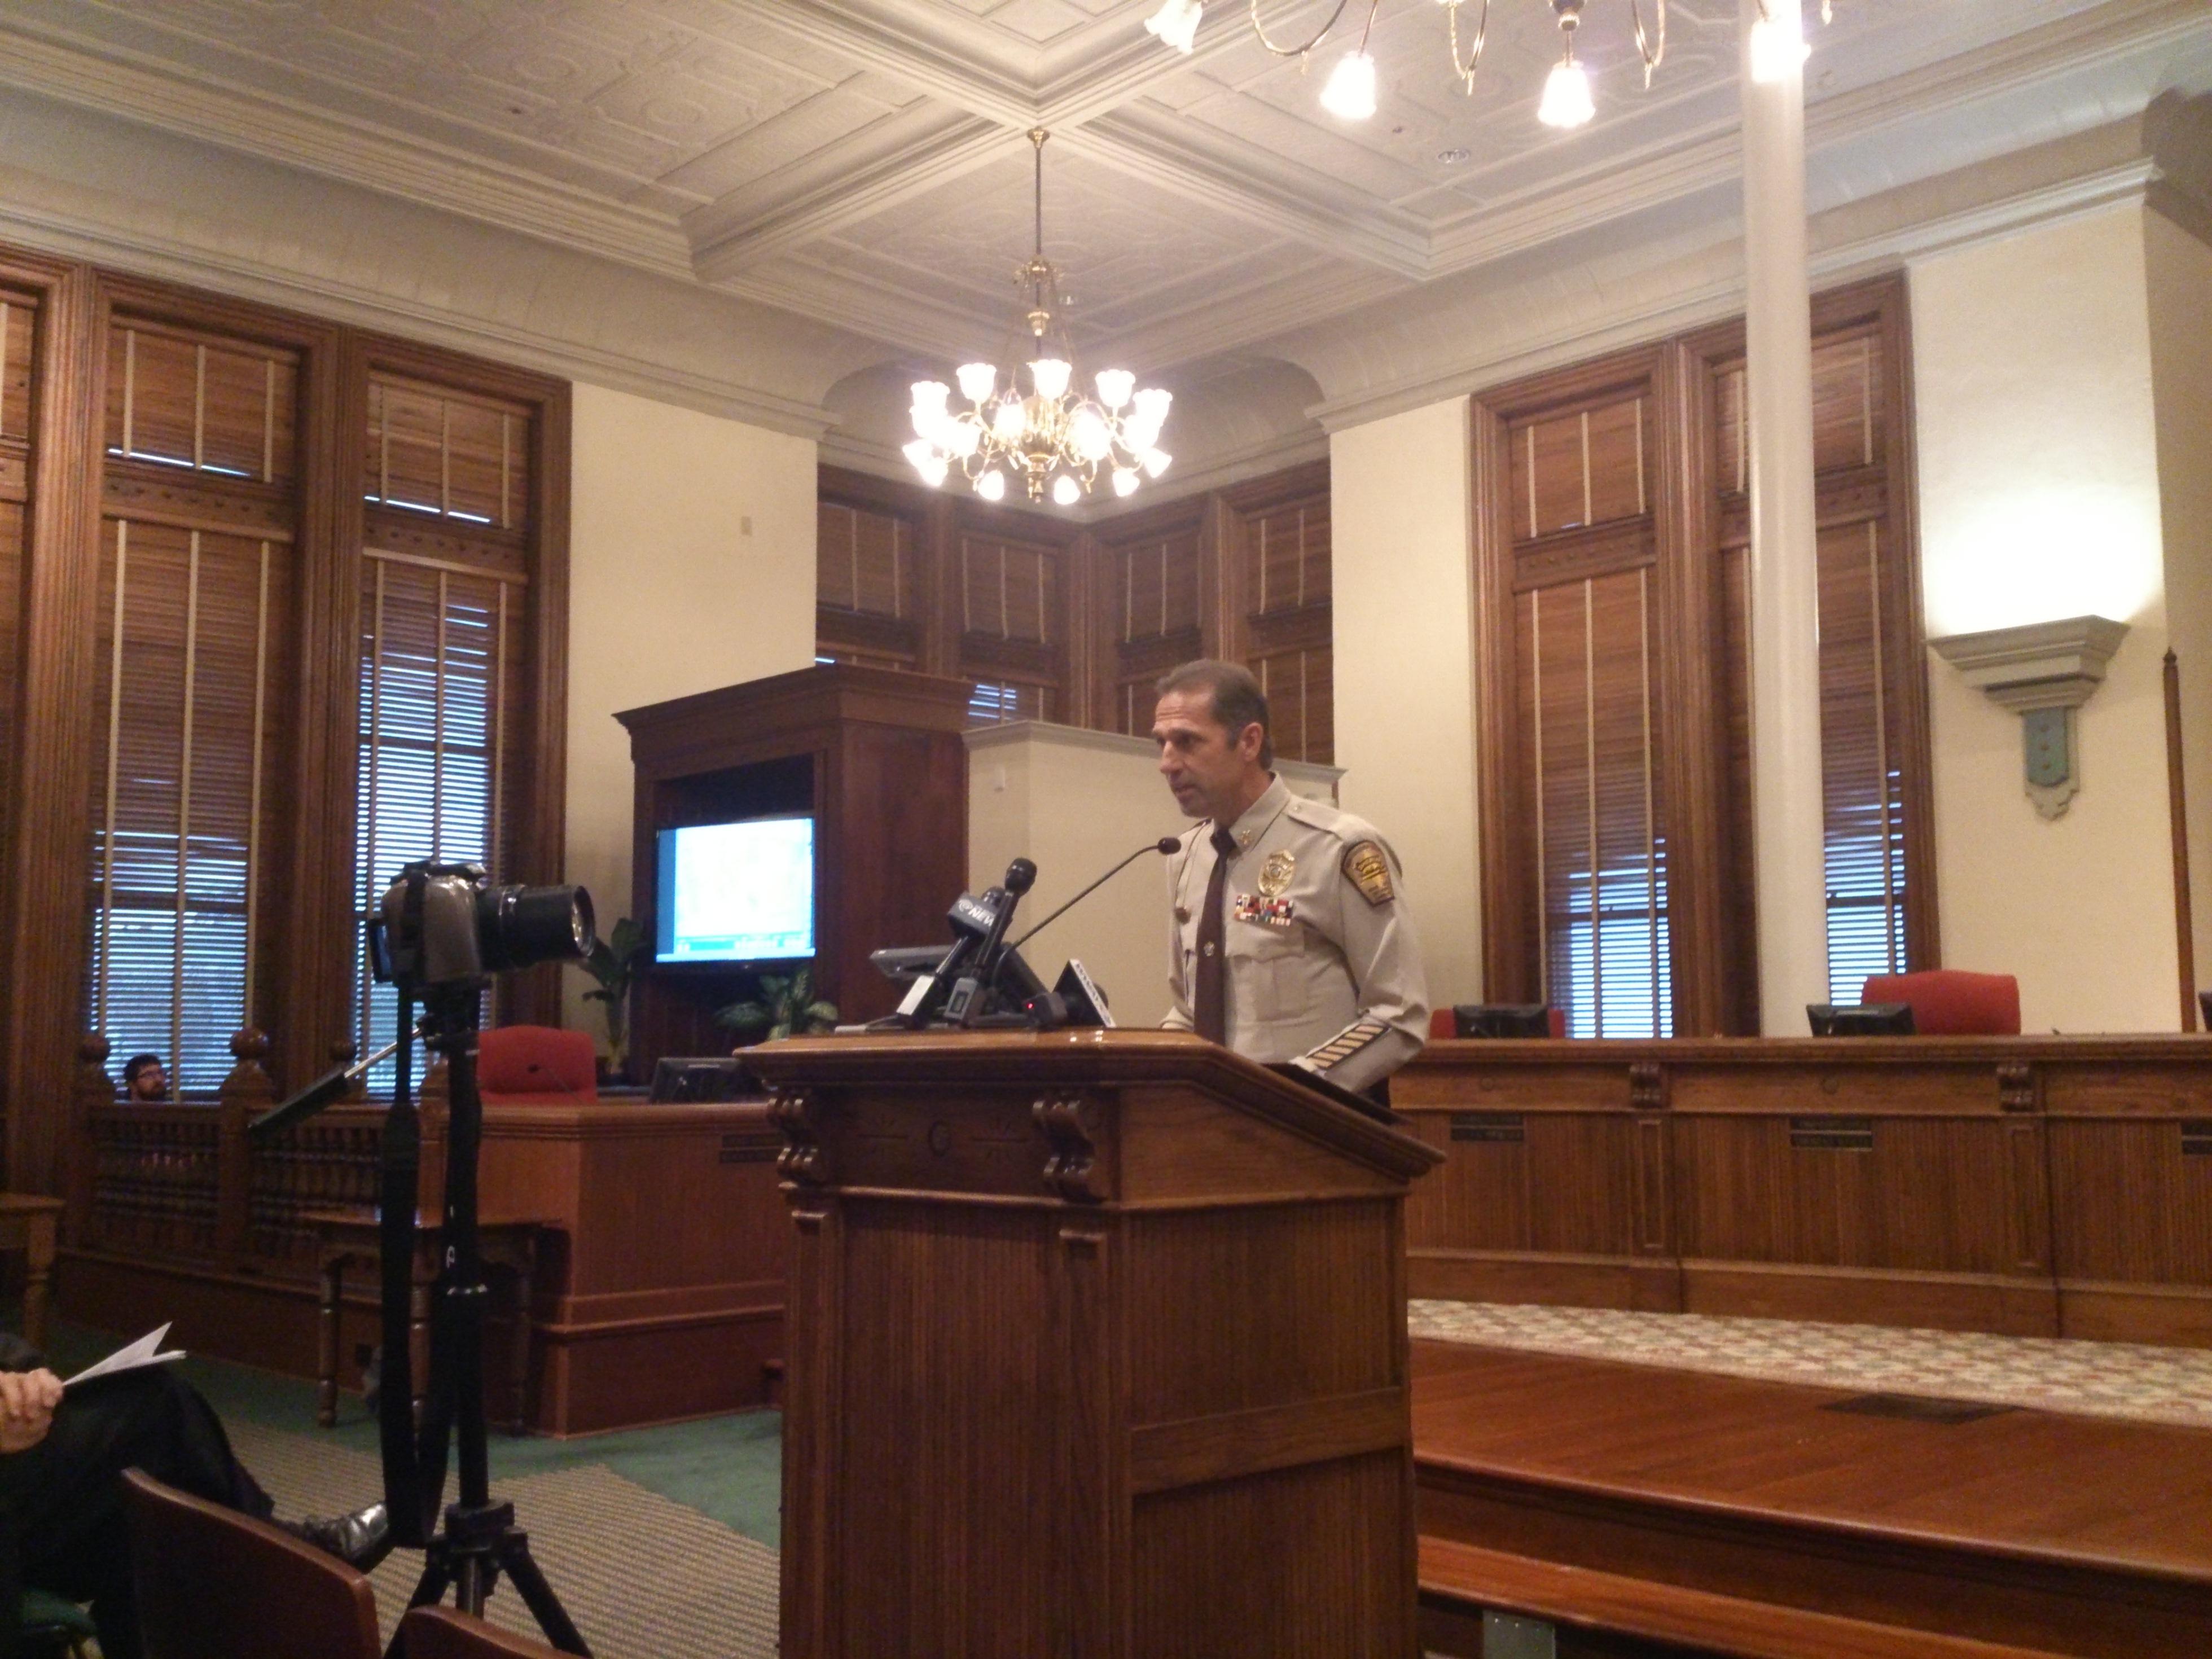 Sheriff releases video in Ron Hewett death - Lumina News